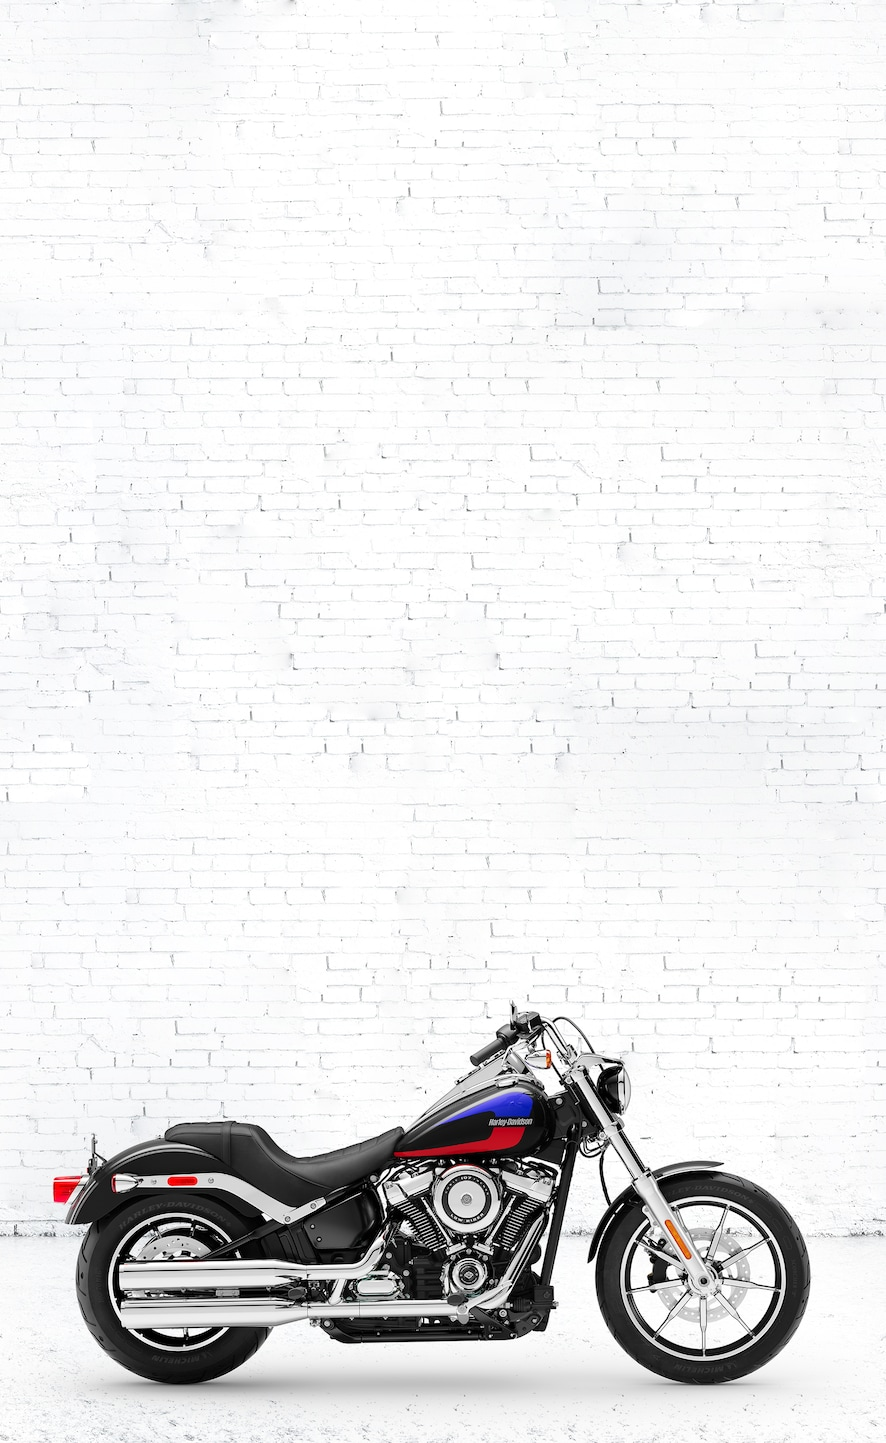 2019 Fxdr Motorcycle Harley Davidson Usa Frame Diagram Low Rider